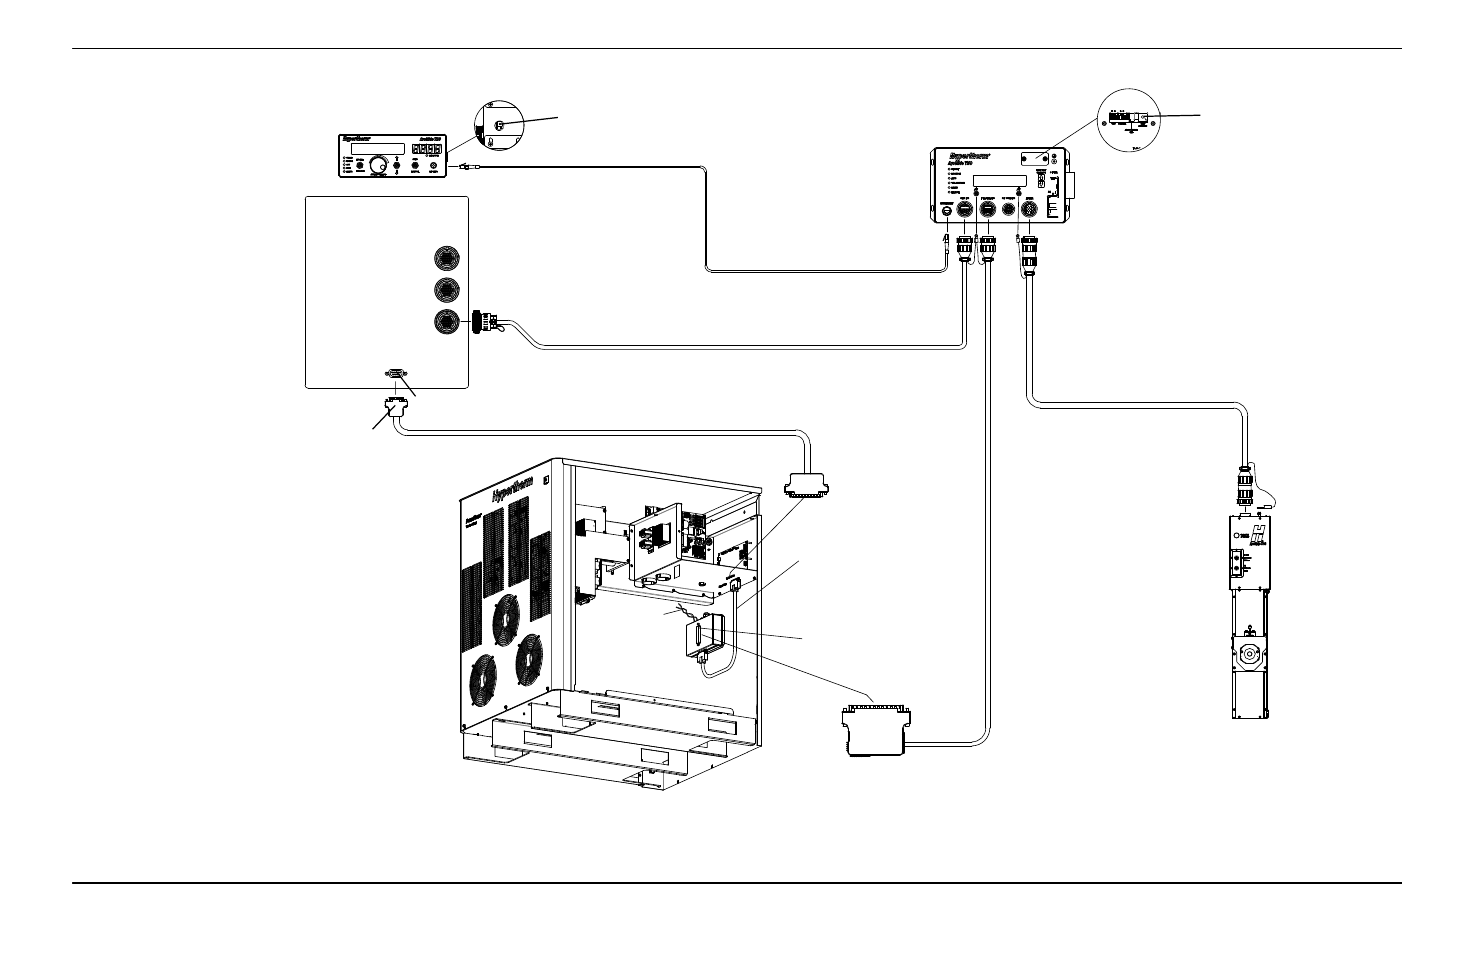 background image. ArcGlide THC Instruction Manual 806450